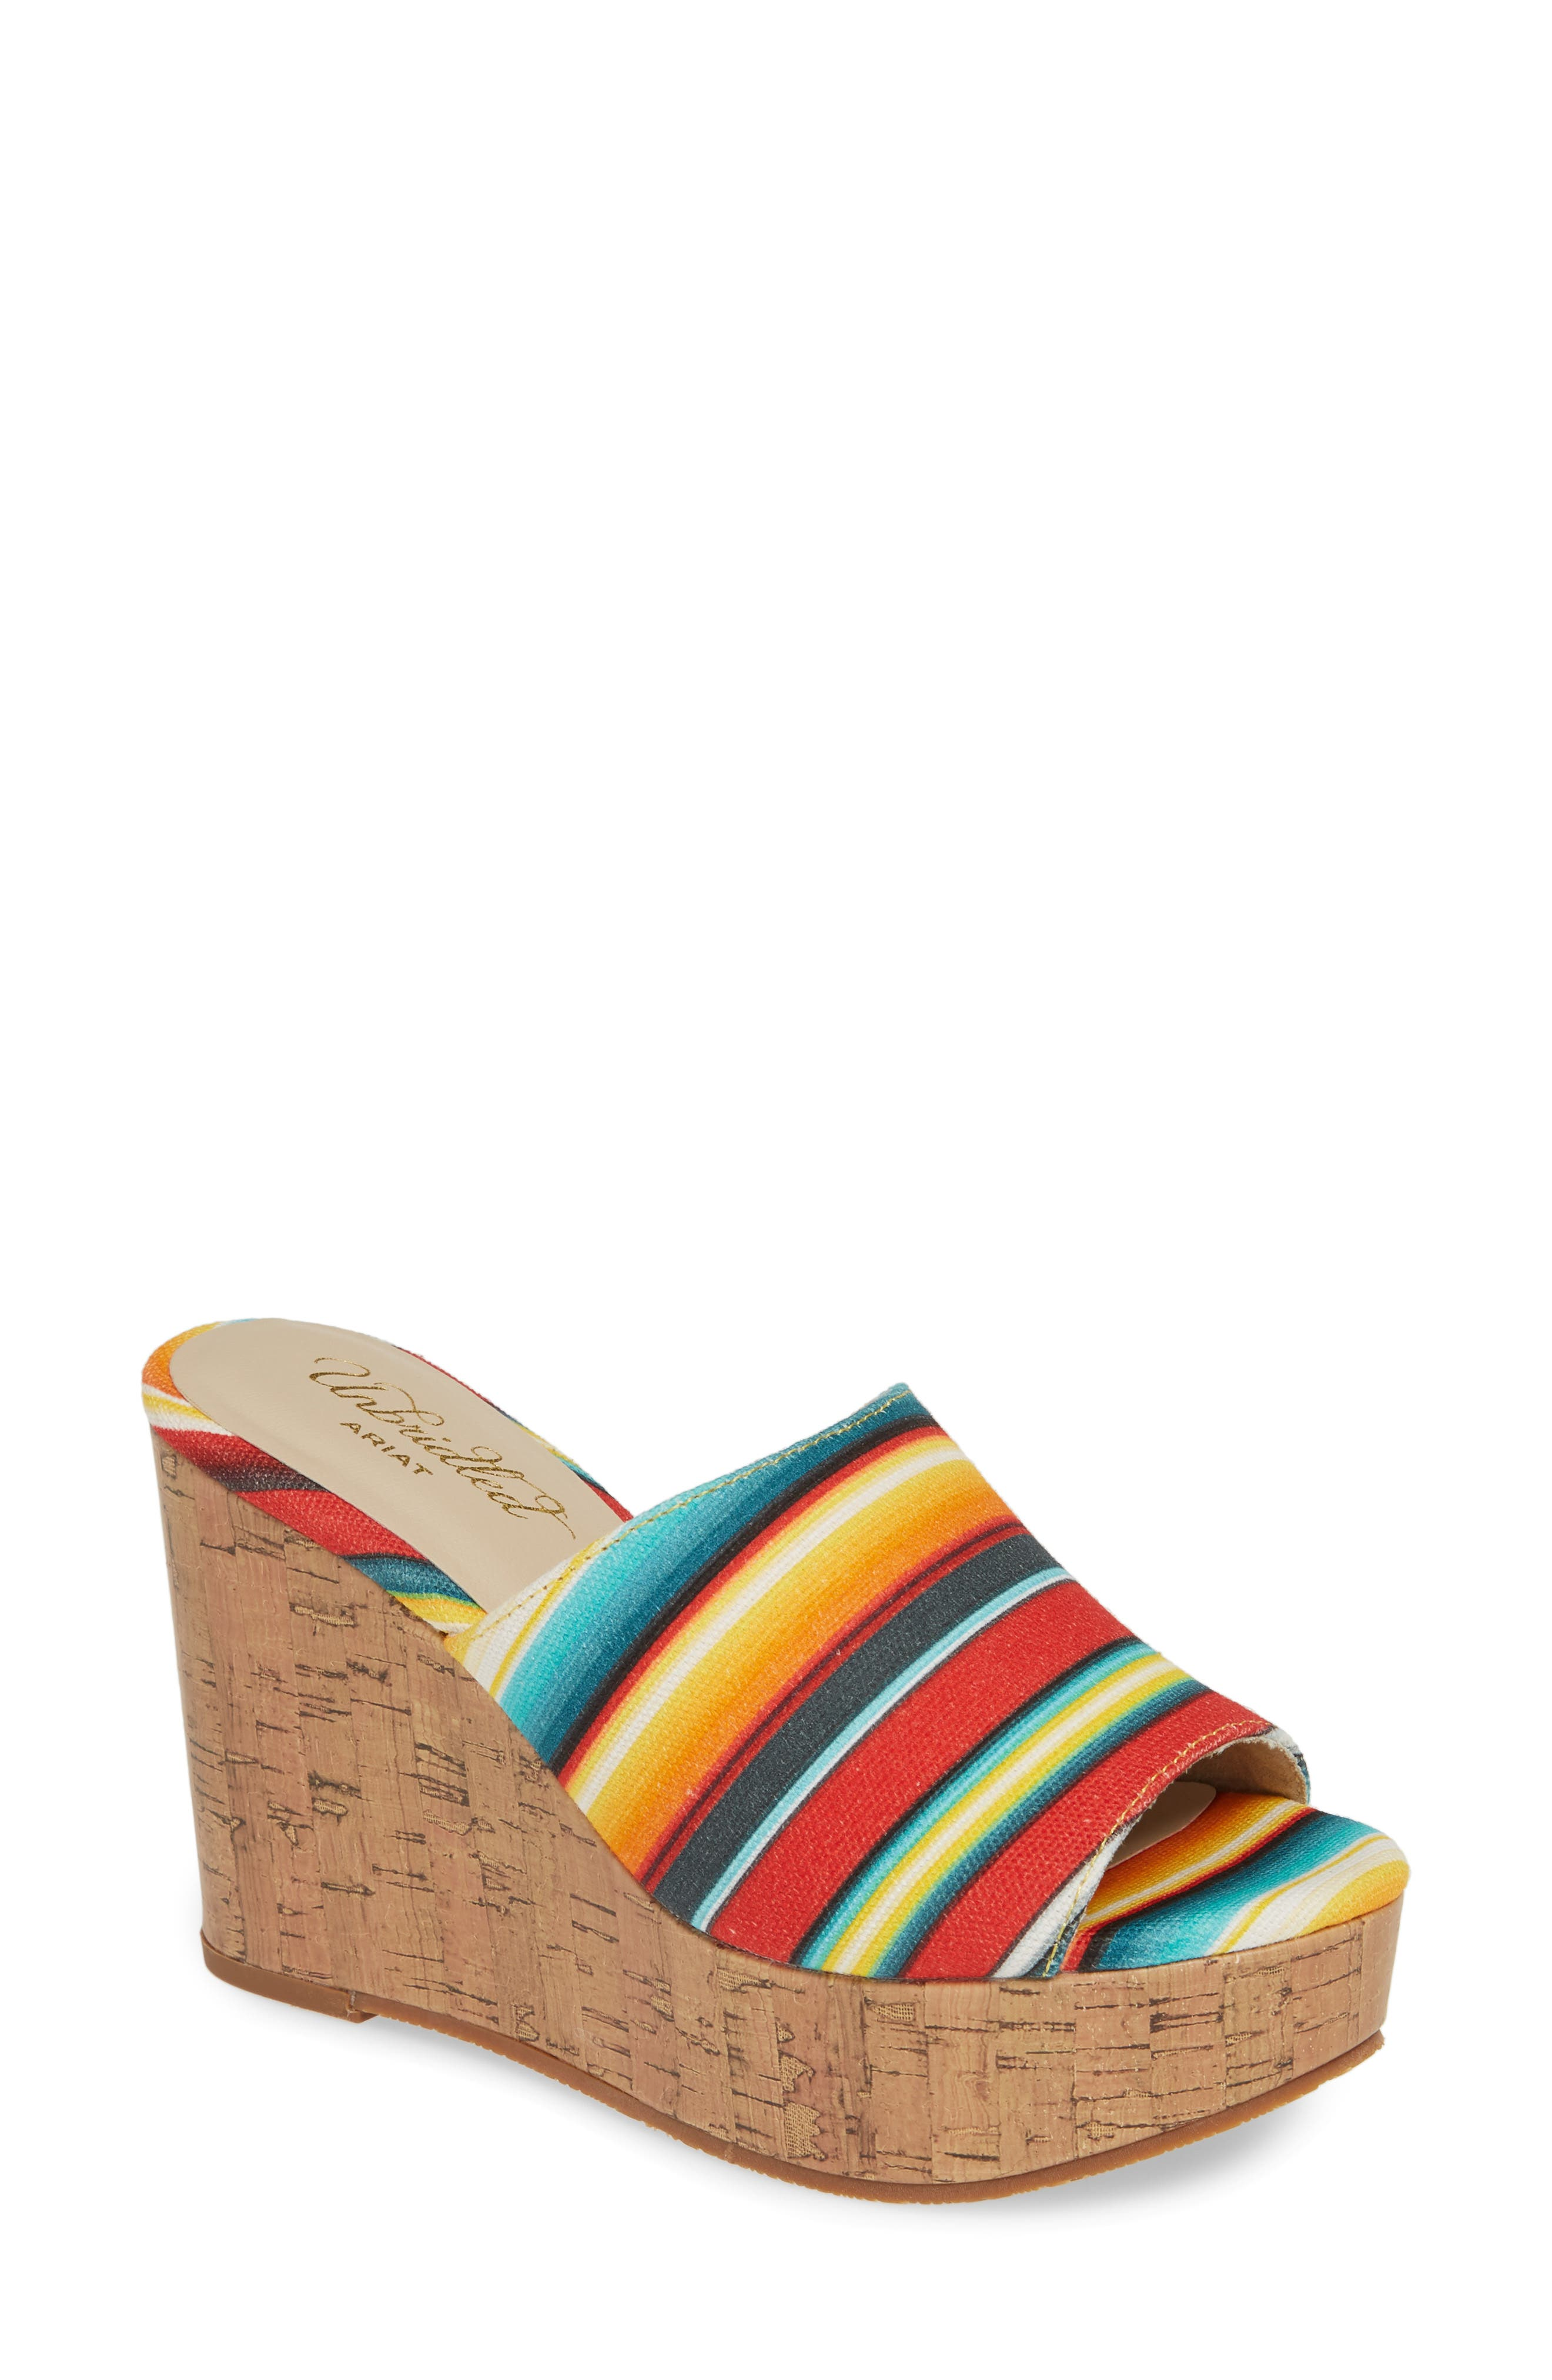 b12bef472b4 Ariat Layla Wedge Slide Sandal- Red